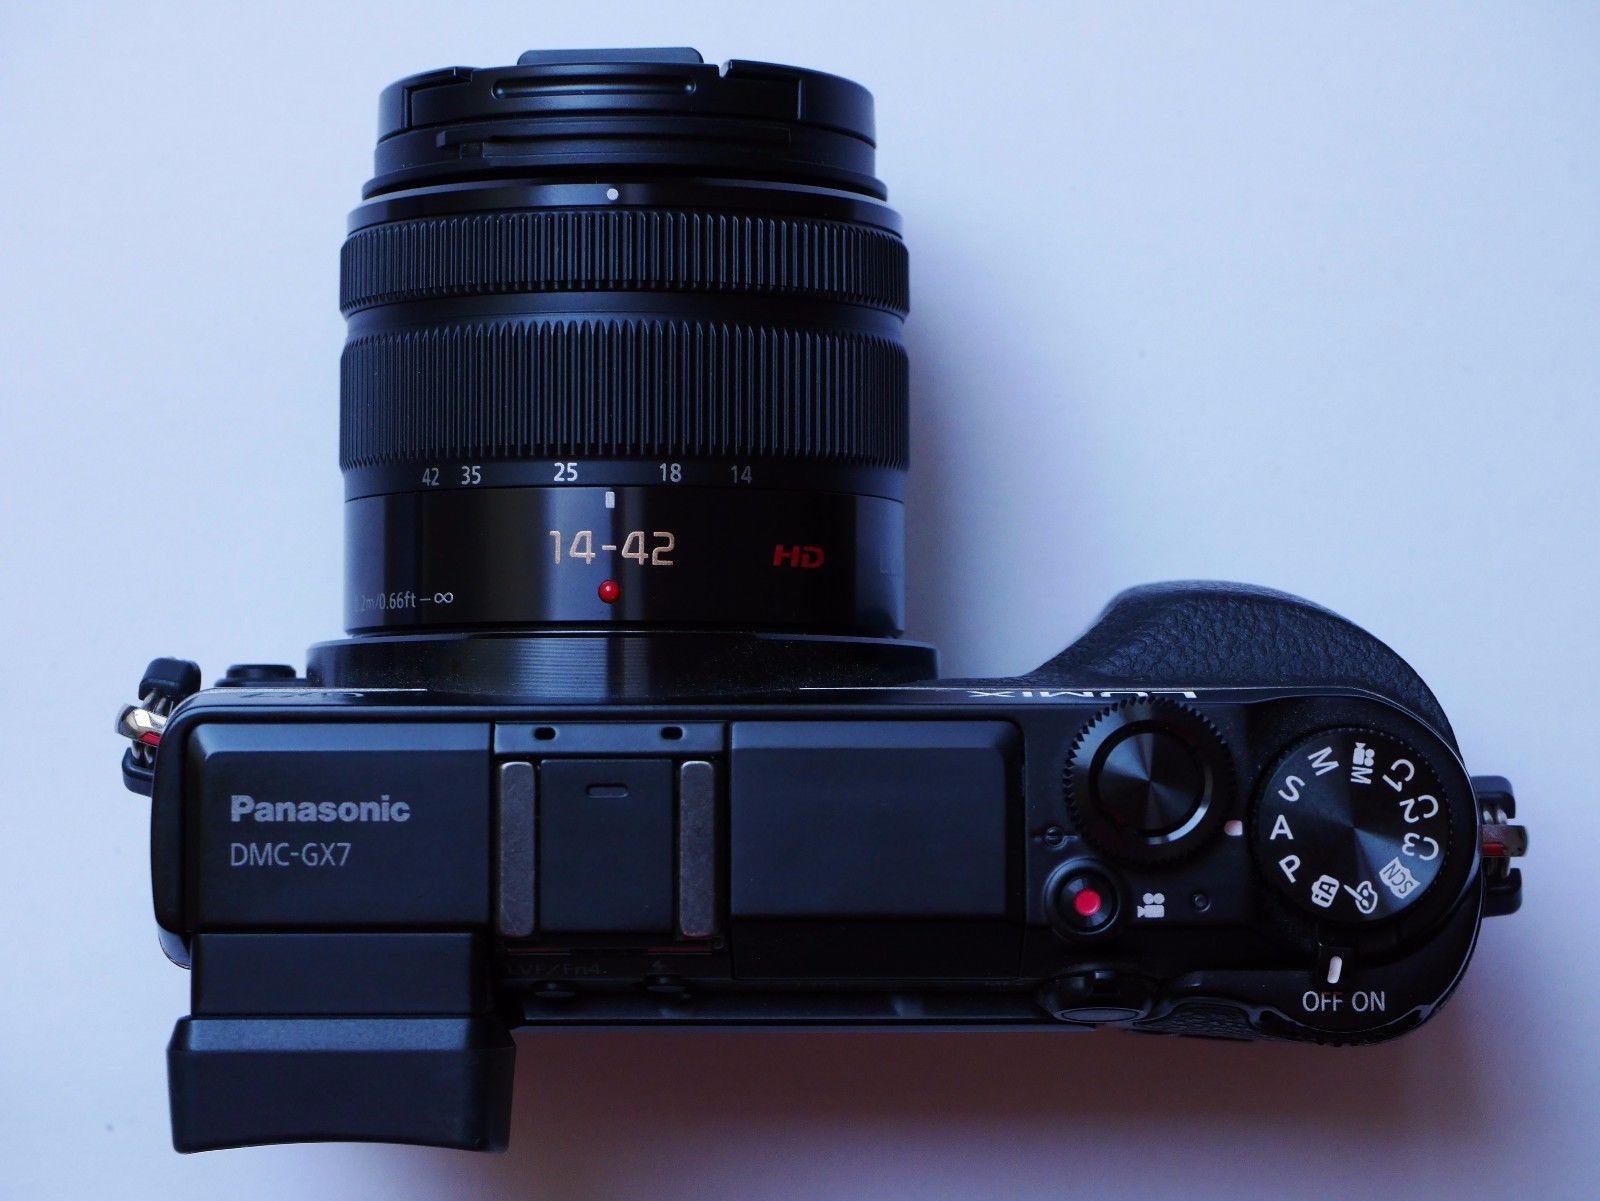 Panasonic LUMIX DMC-GX7 16.0MP Digitalkamera - Schwarz (Kit mit G ASPH. MEGA...